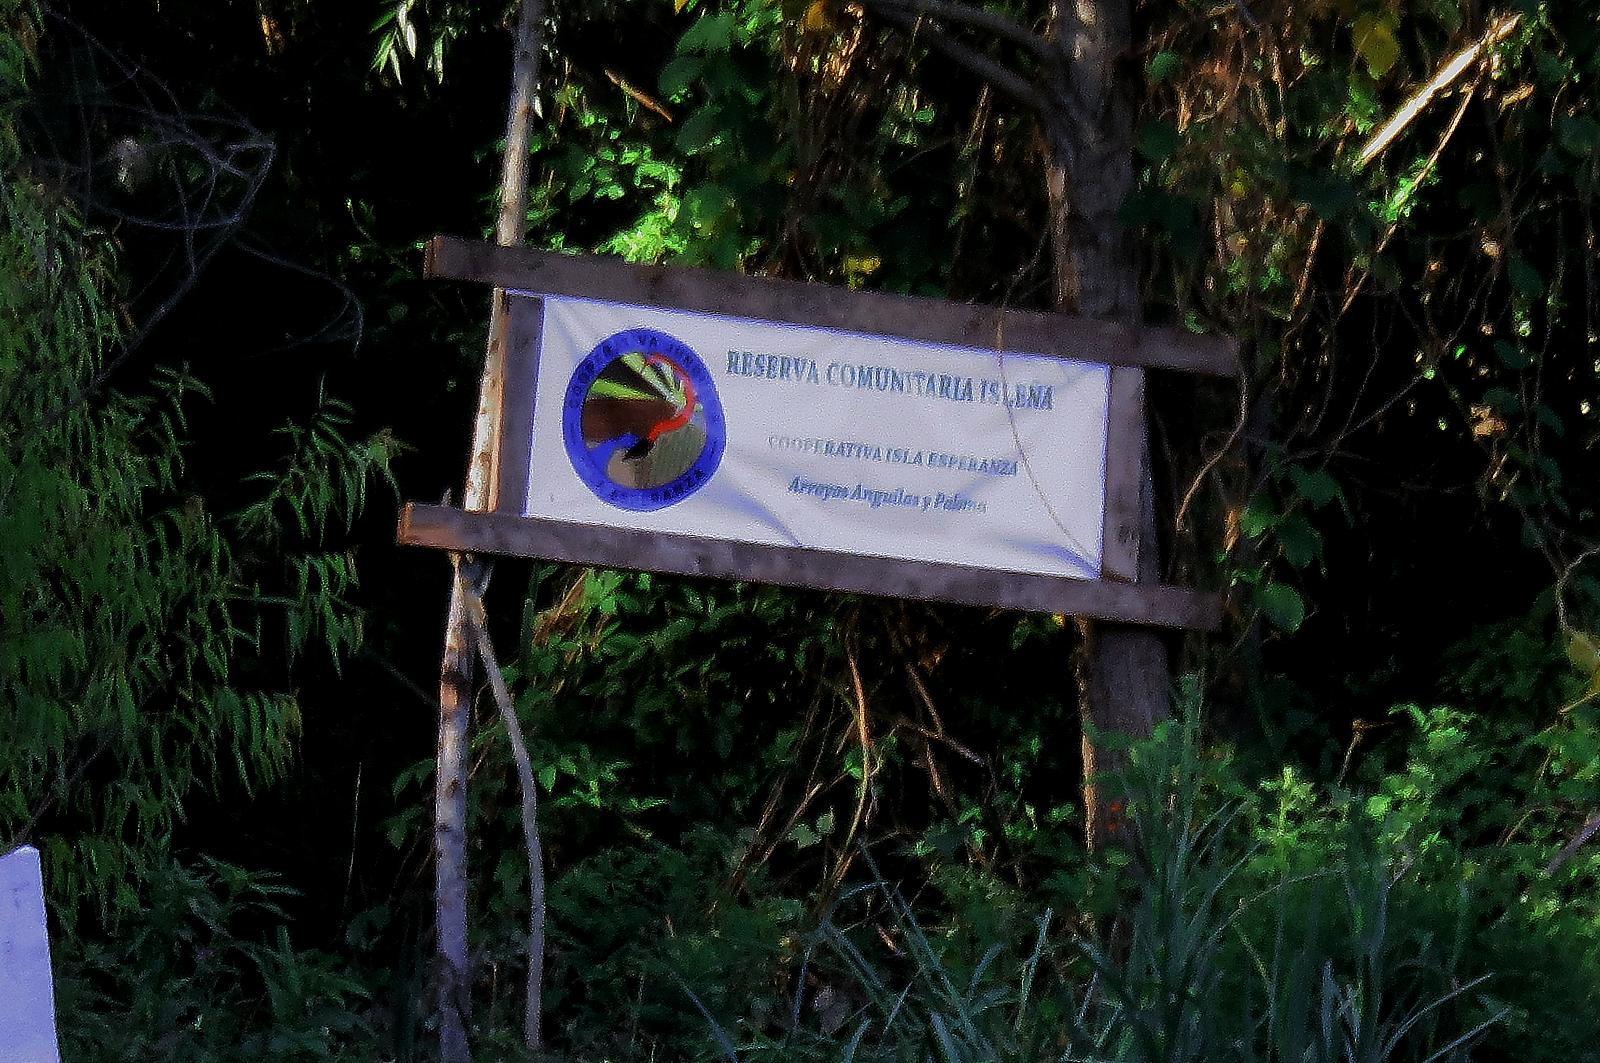 Reserva comunitaria